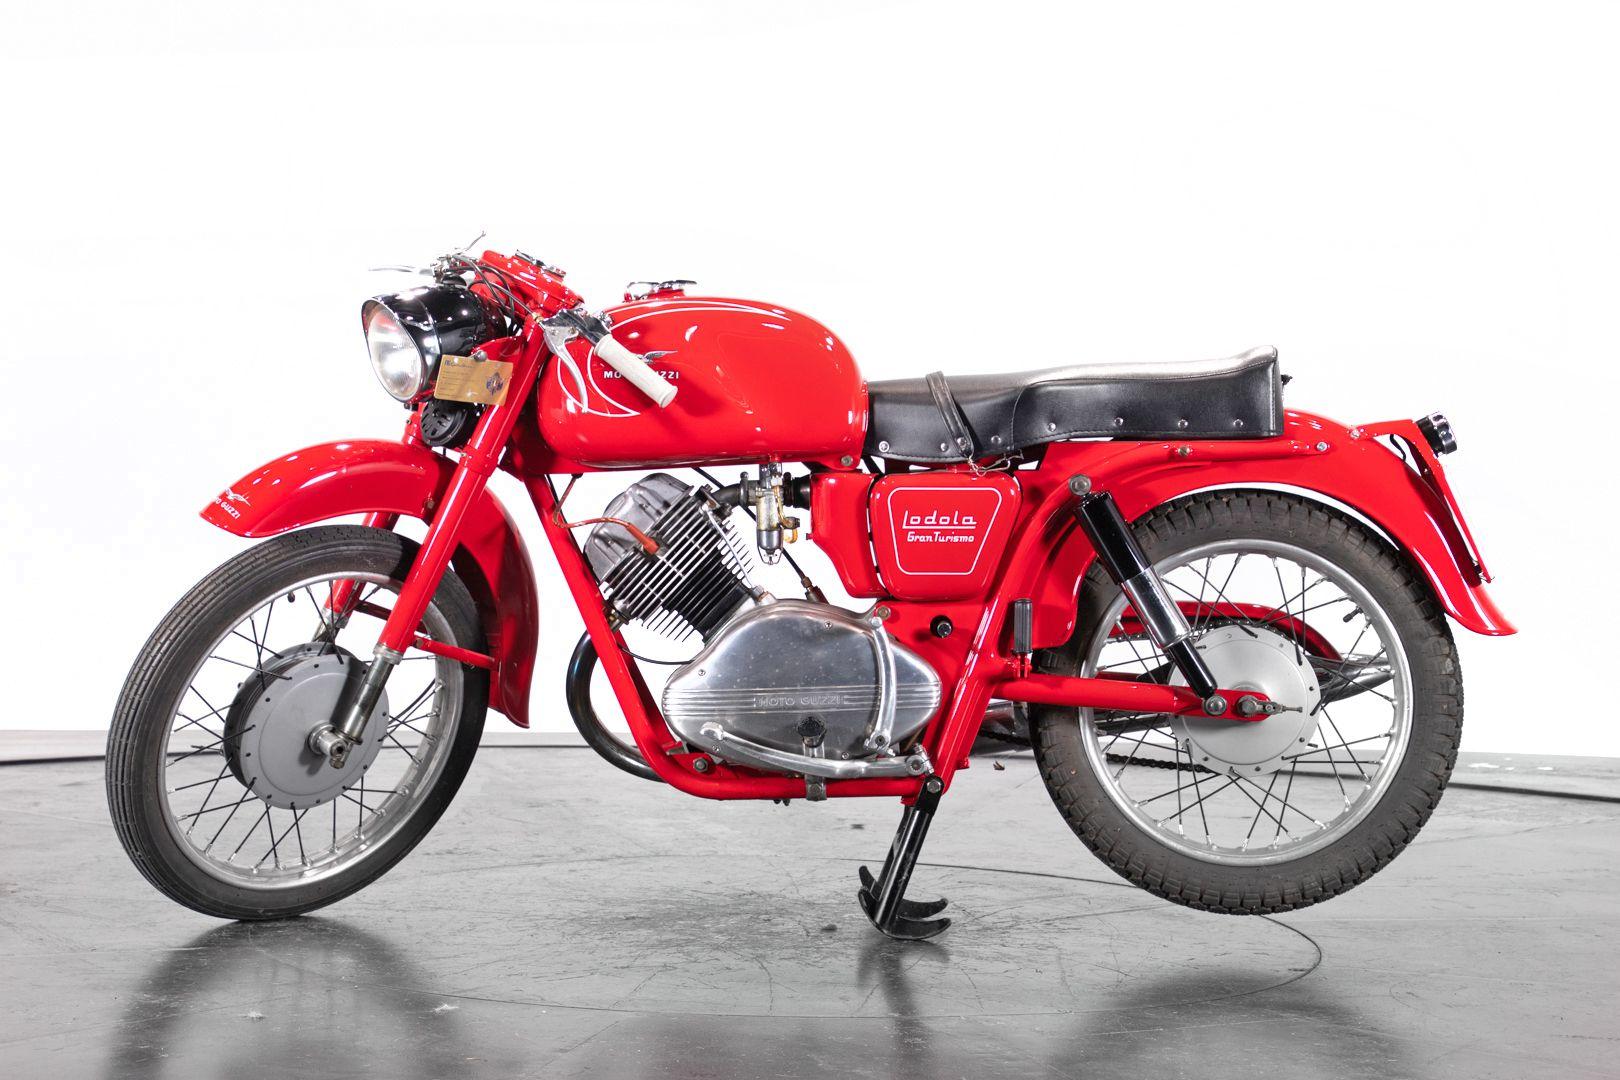 1959 Moto Guzzi Lodola 235 GT 41884